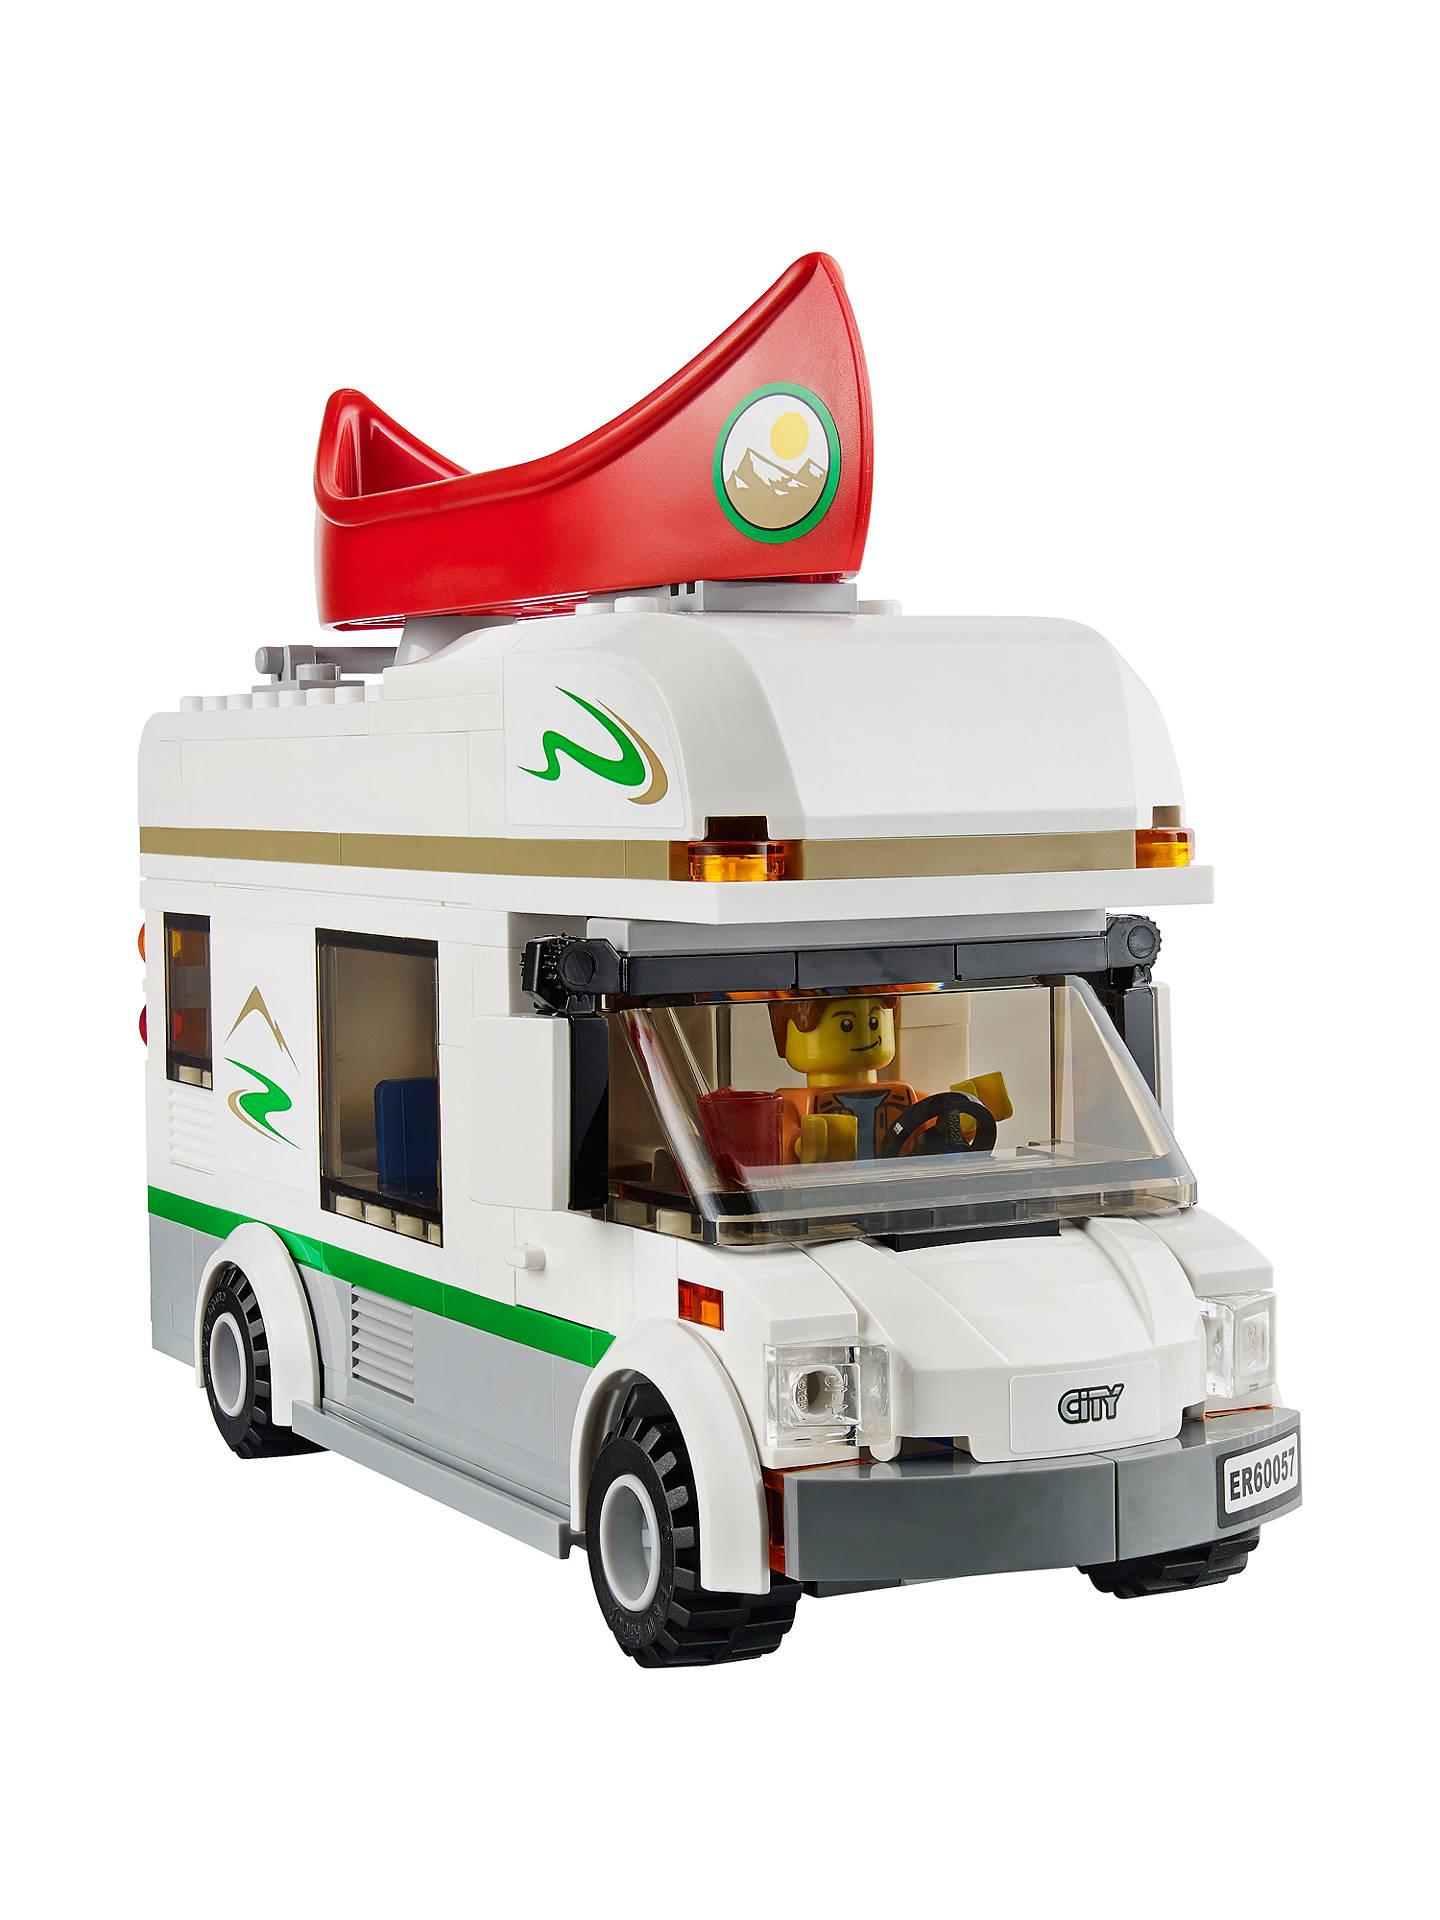 LEGO City Camper Van at John Lewis & Partners